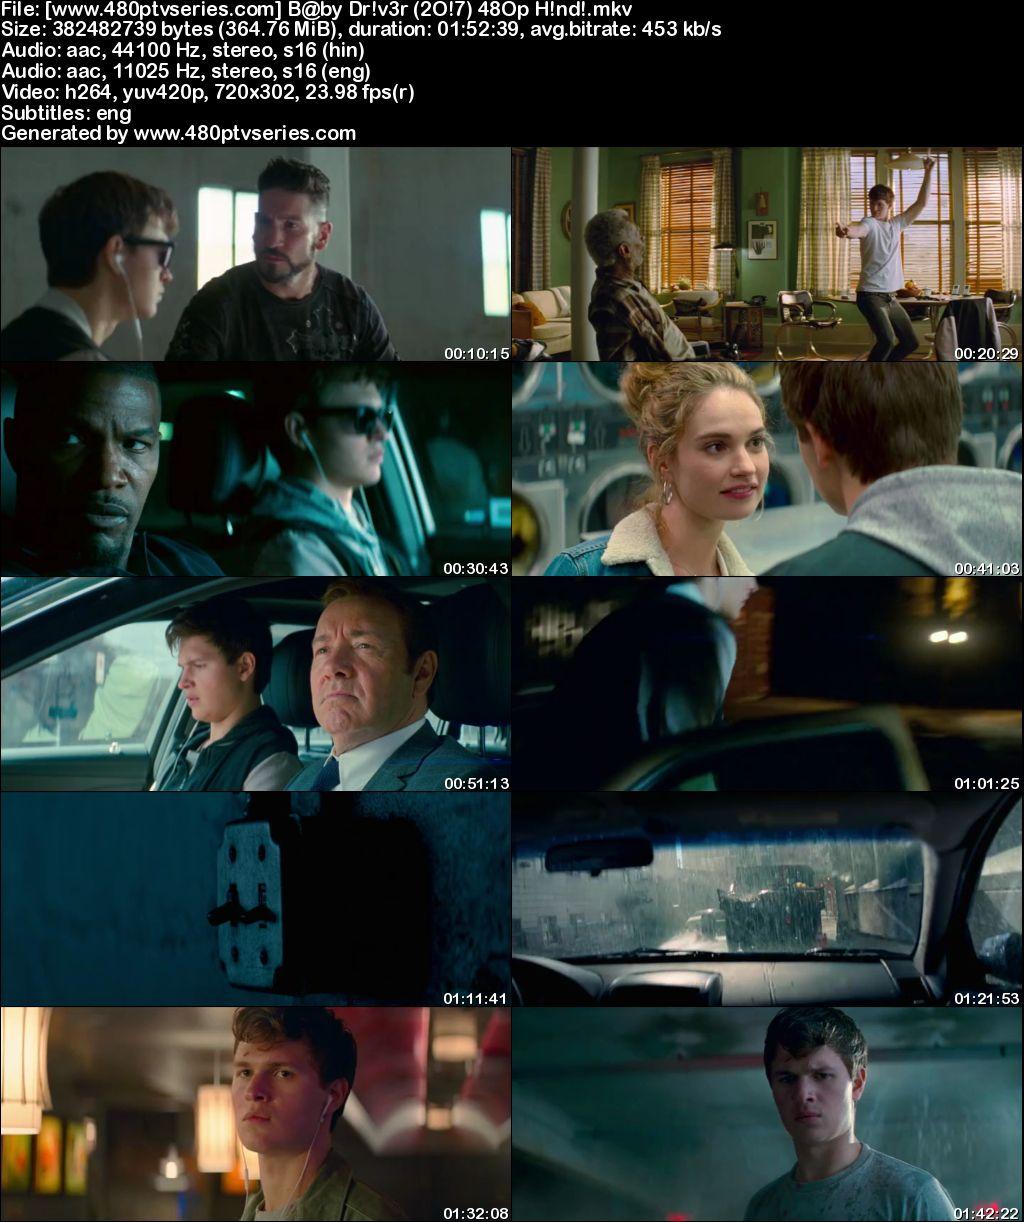 Baby Driver (2017) 350MB Full Hindi Dual Audio Movie Download 480p Bluray Free Watch Online Full Movie Download Worldfree4u 9xmovies